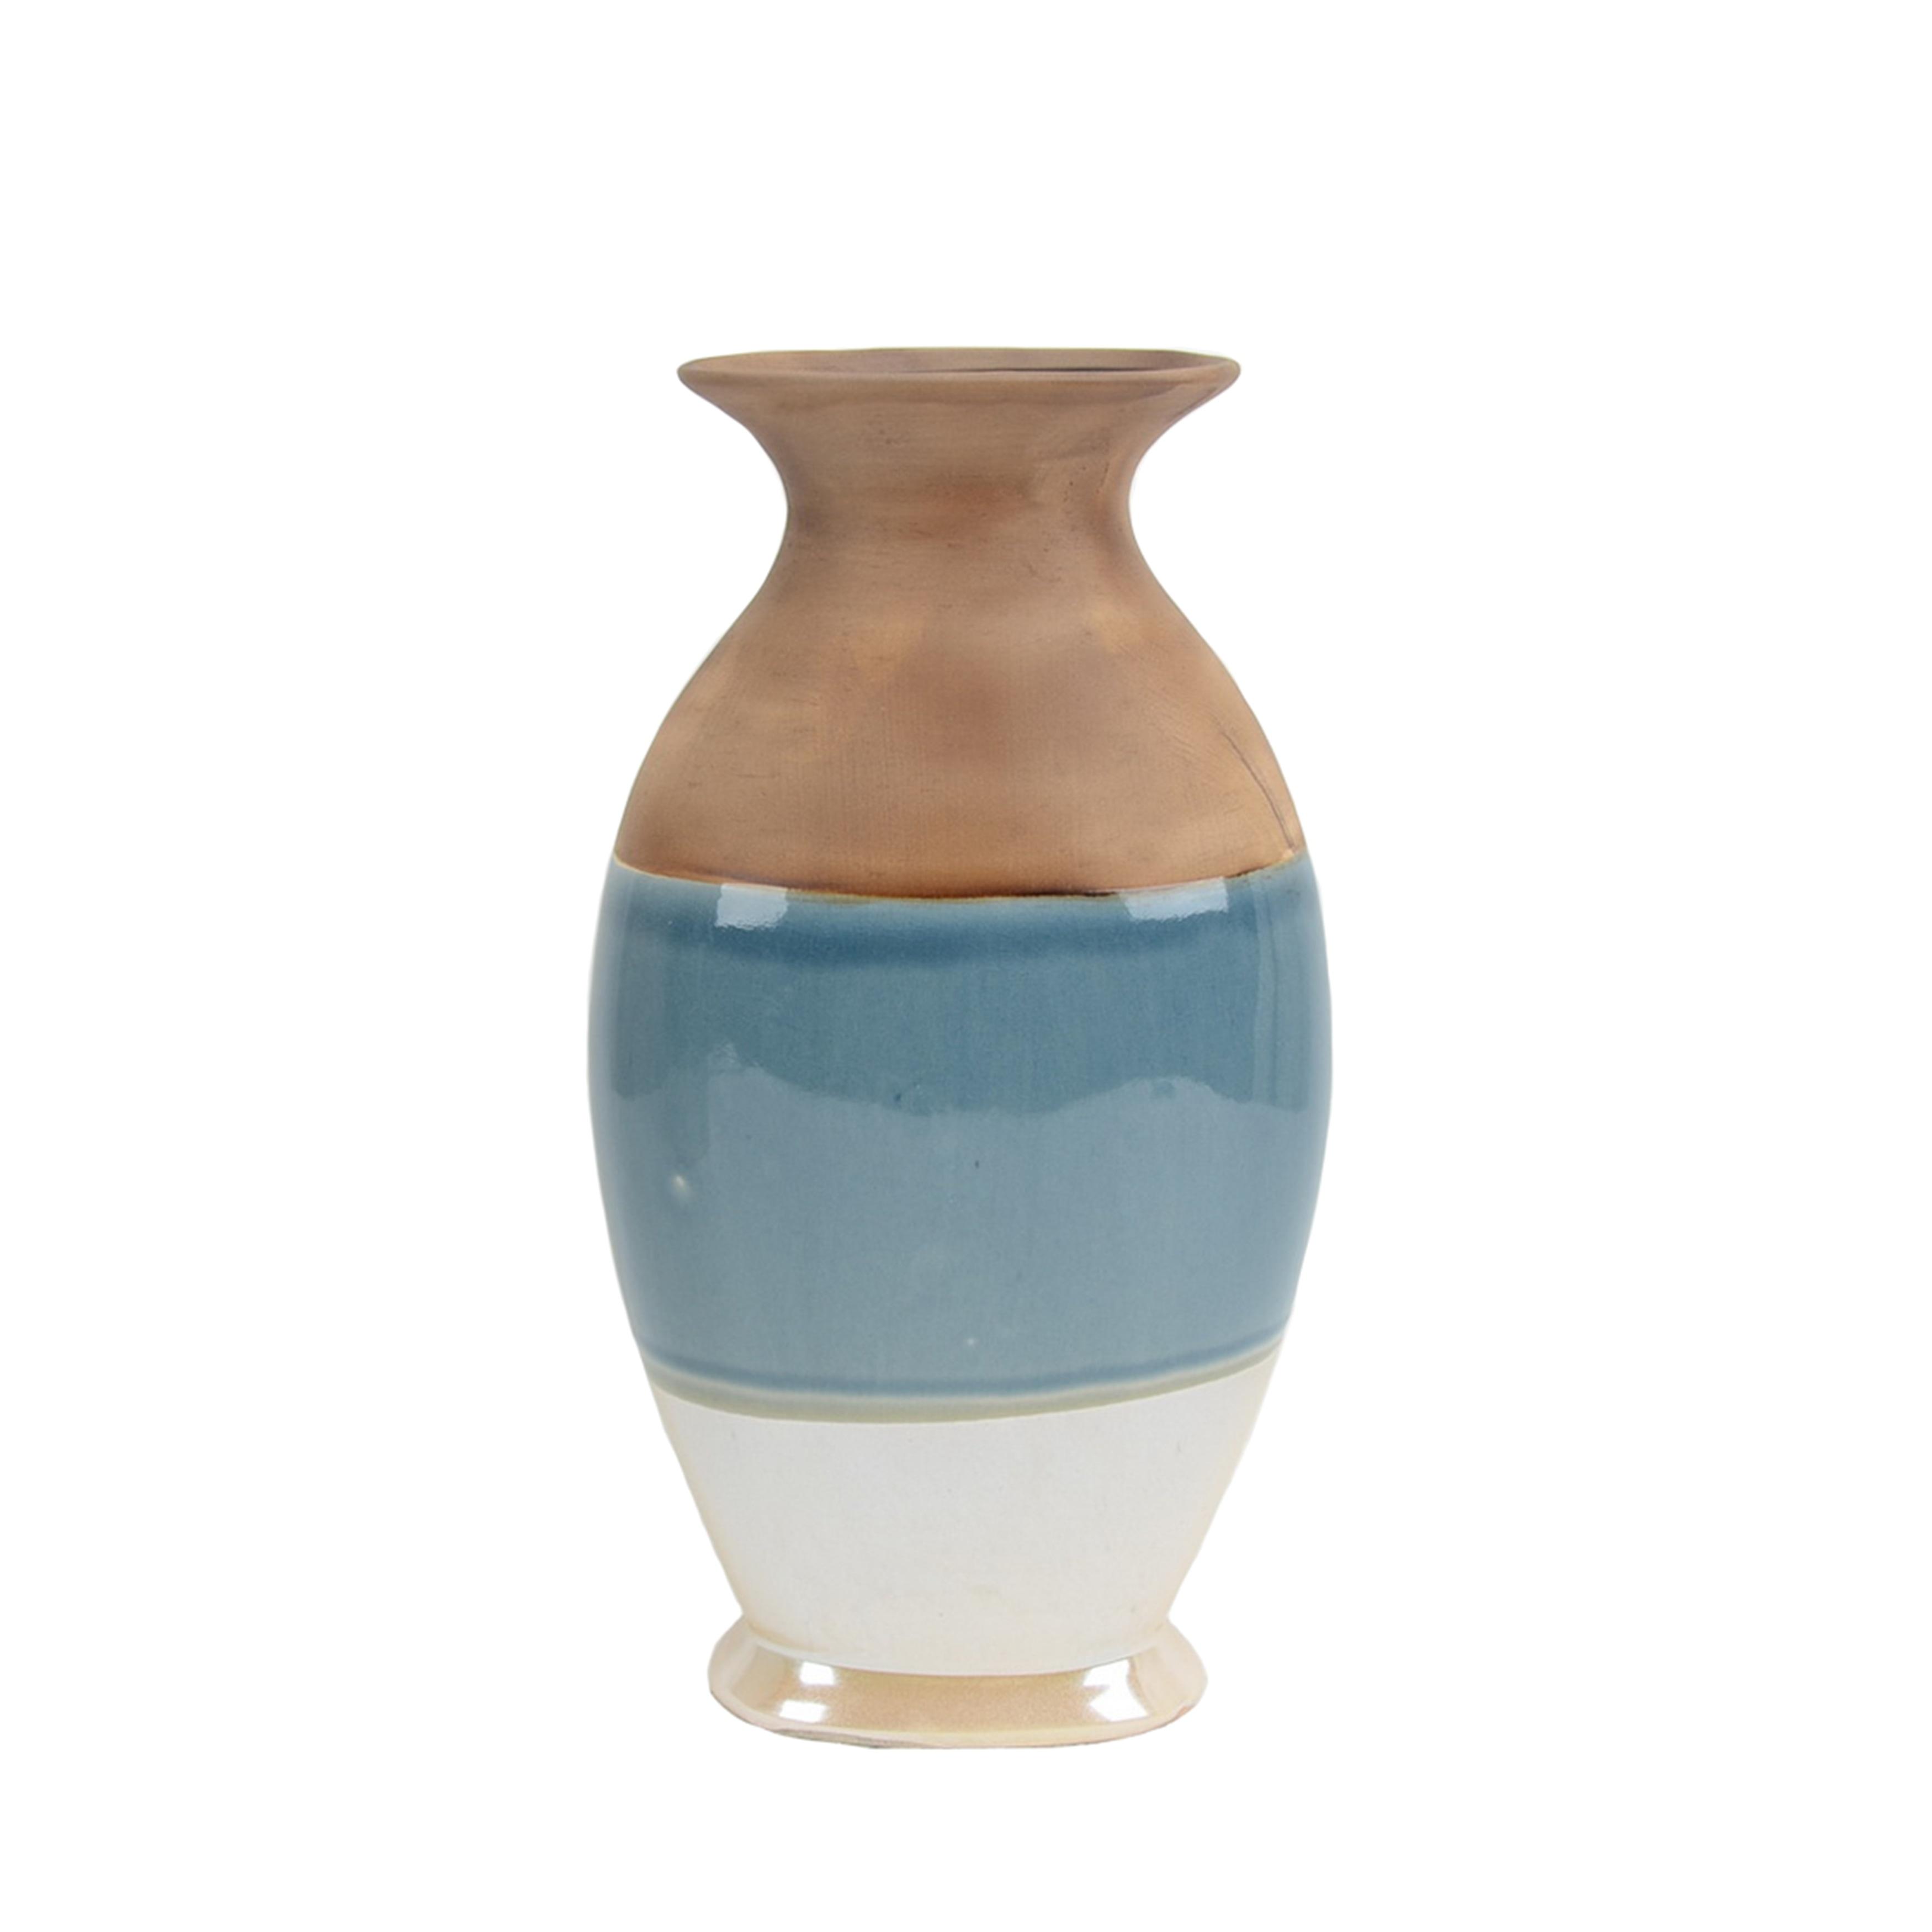 Decorative Urn Shape Ceramic Vase with Flared Opening and Bottom Rim, Multicolor